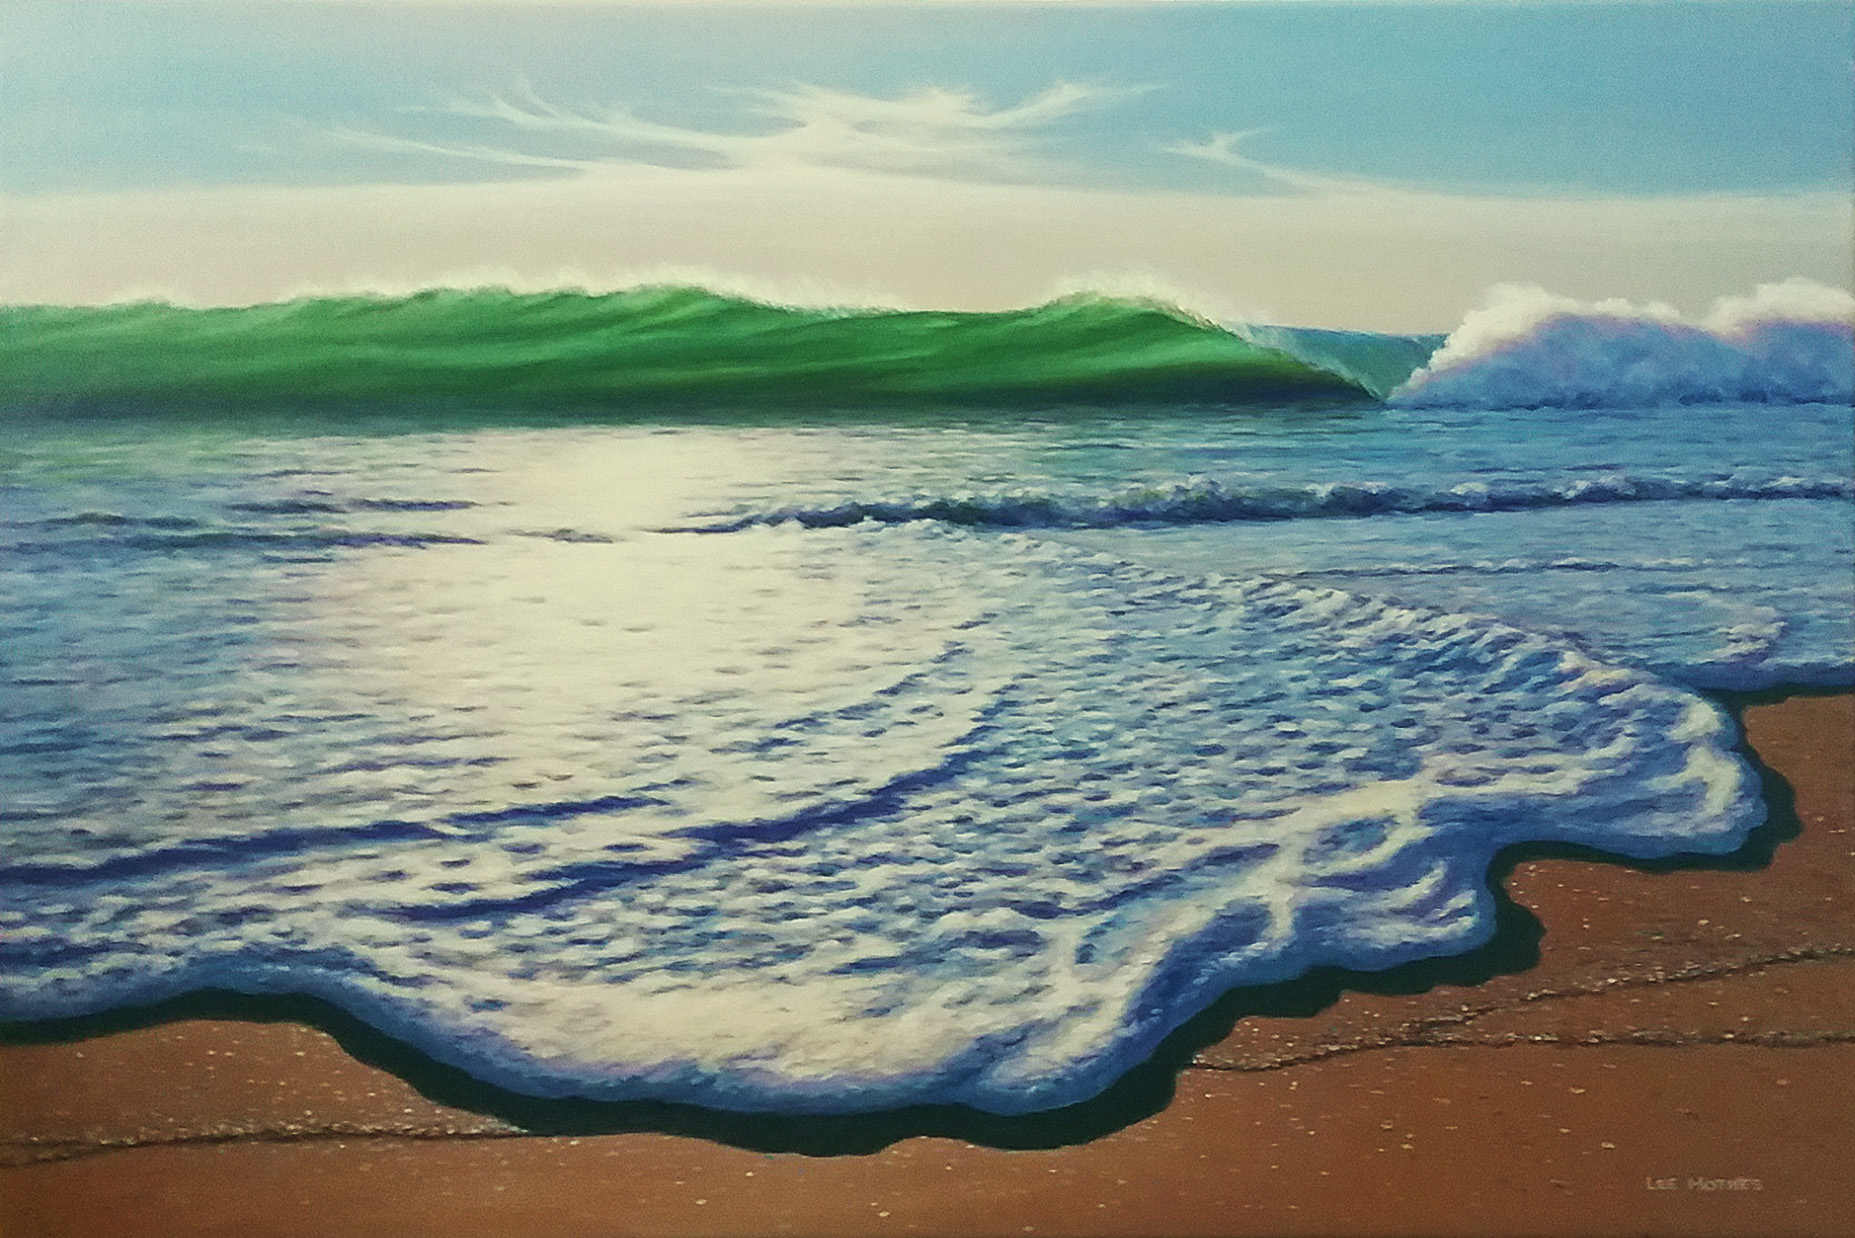 "Edge of the Desert, 24"" by 36"" acrylic on canvas (abvailble at Jill Logan Galeria, Todos Santos, Baja Califorinia)"